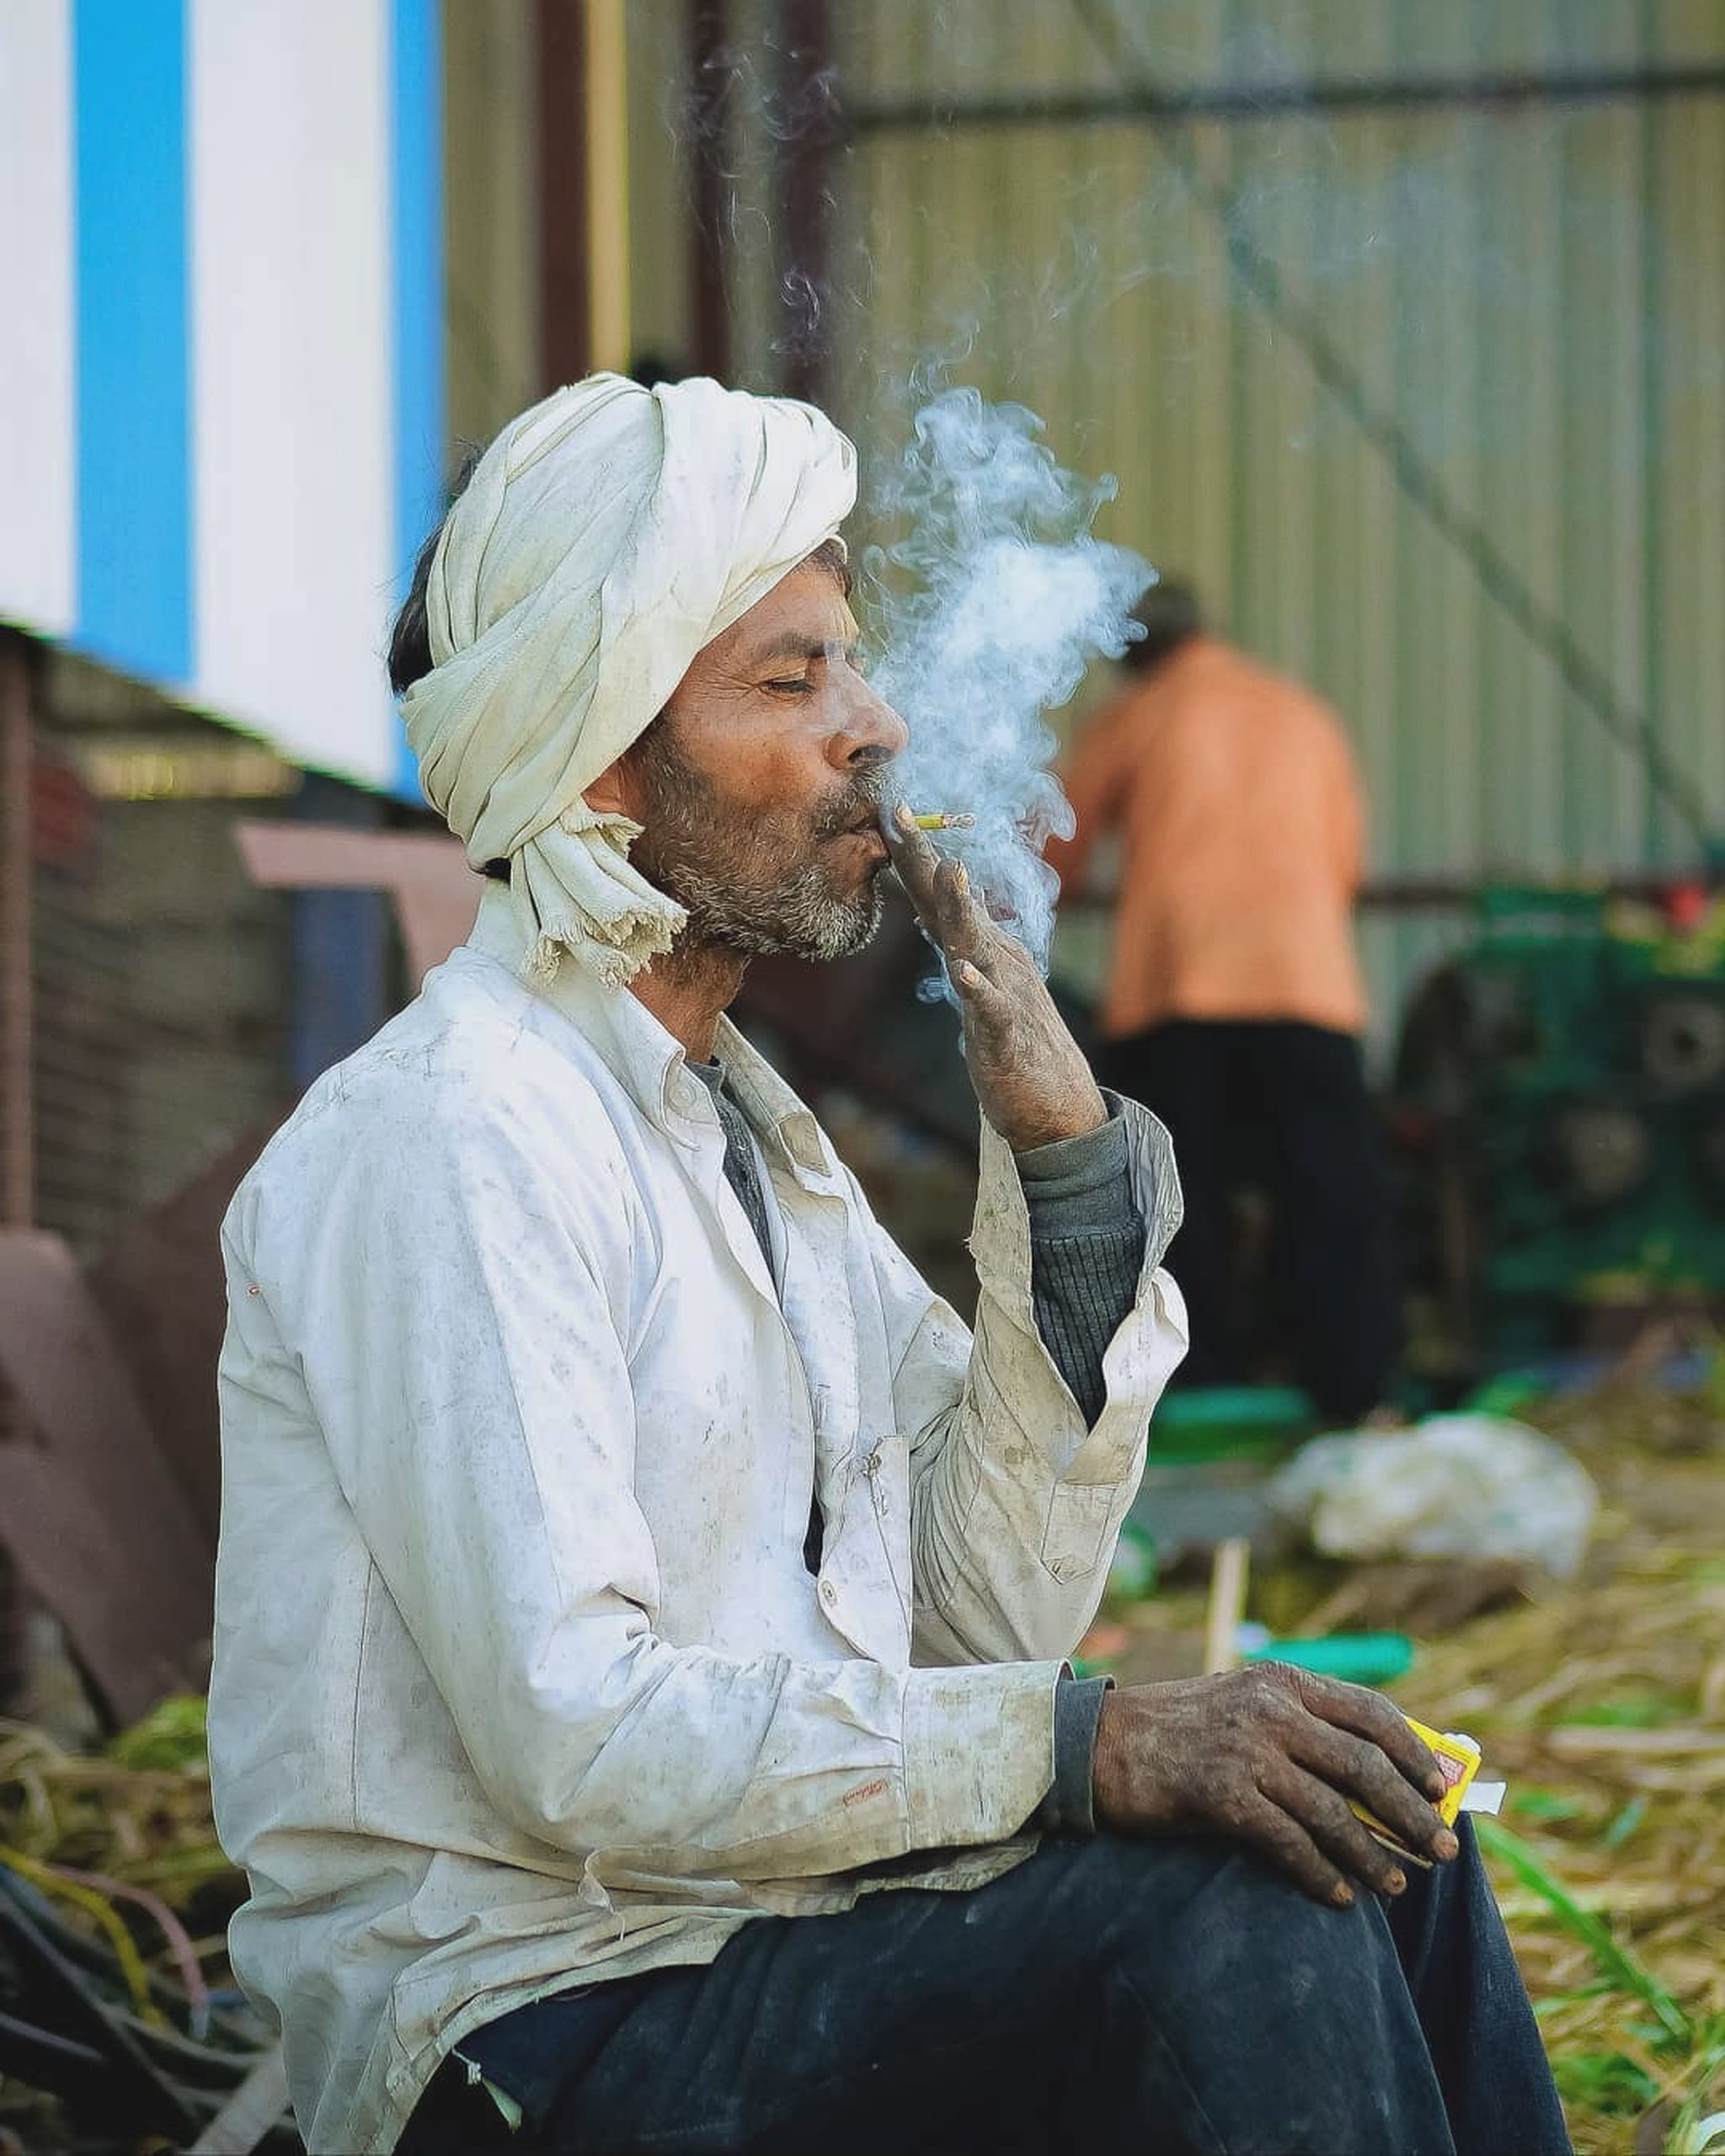 A man smoking cigarettes.